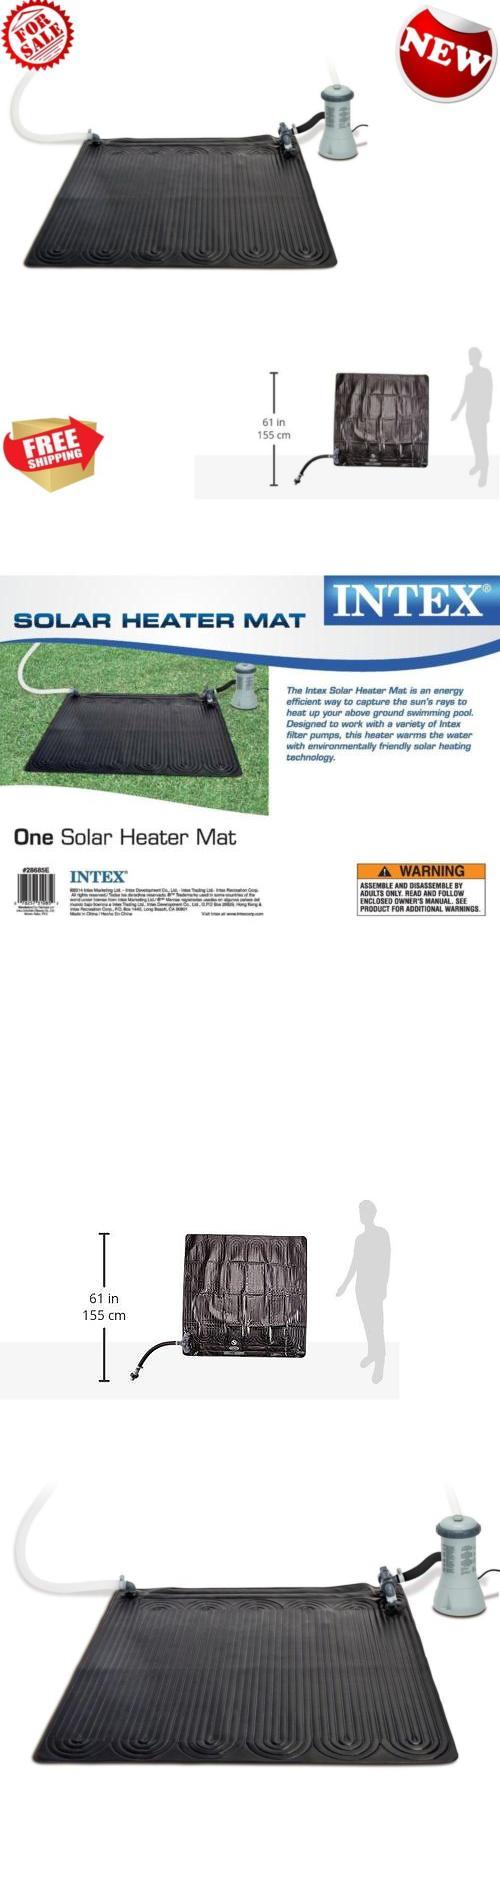 Pool heaters and solar panels 42239 intex solar heater mat above pool heaters and solar panels 42239 intex solar heater mat above ground swimming pool compatible sciox Gallery